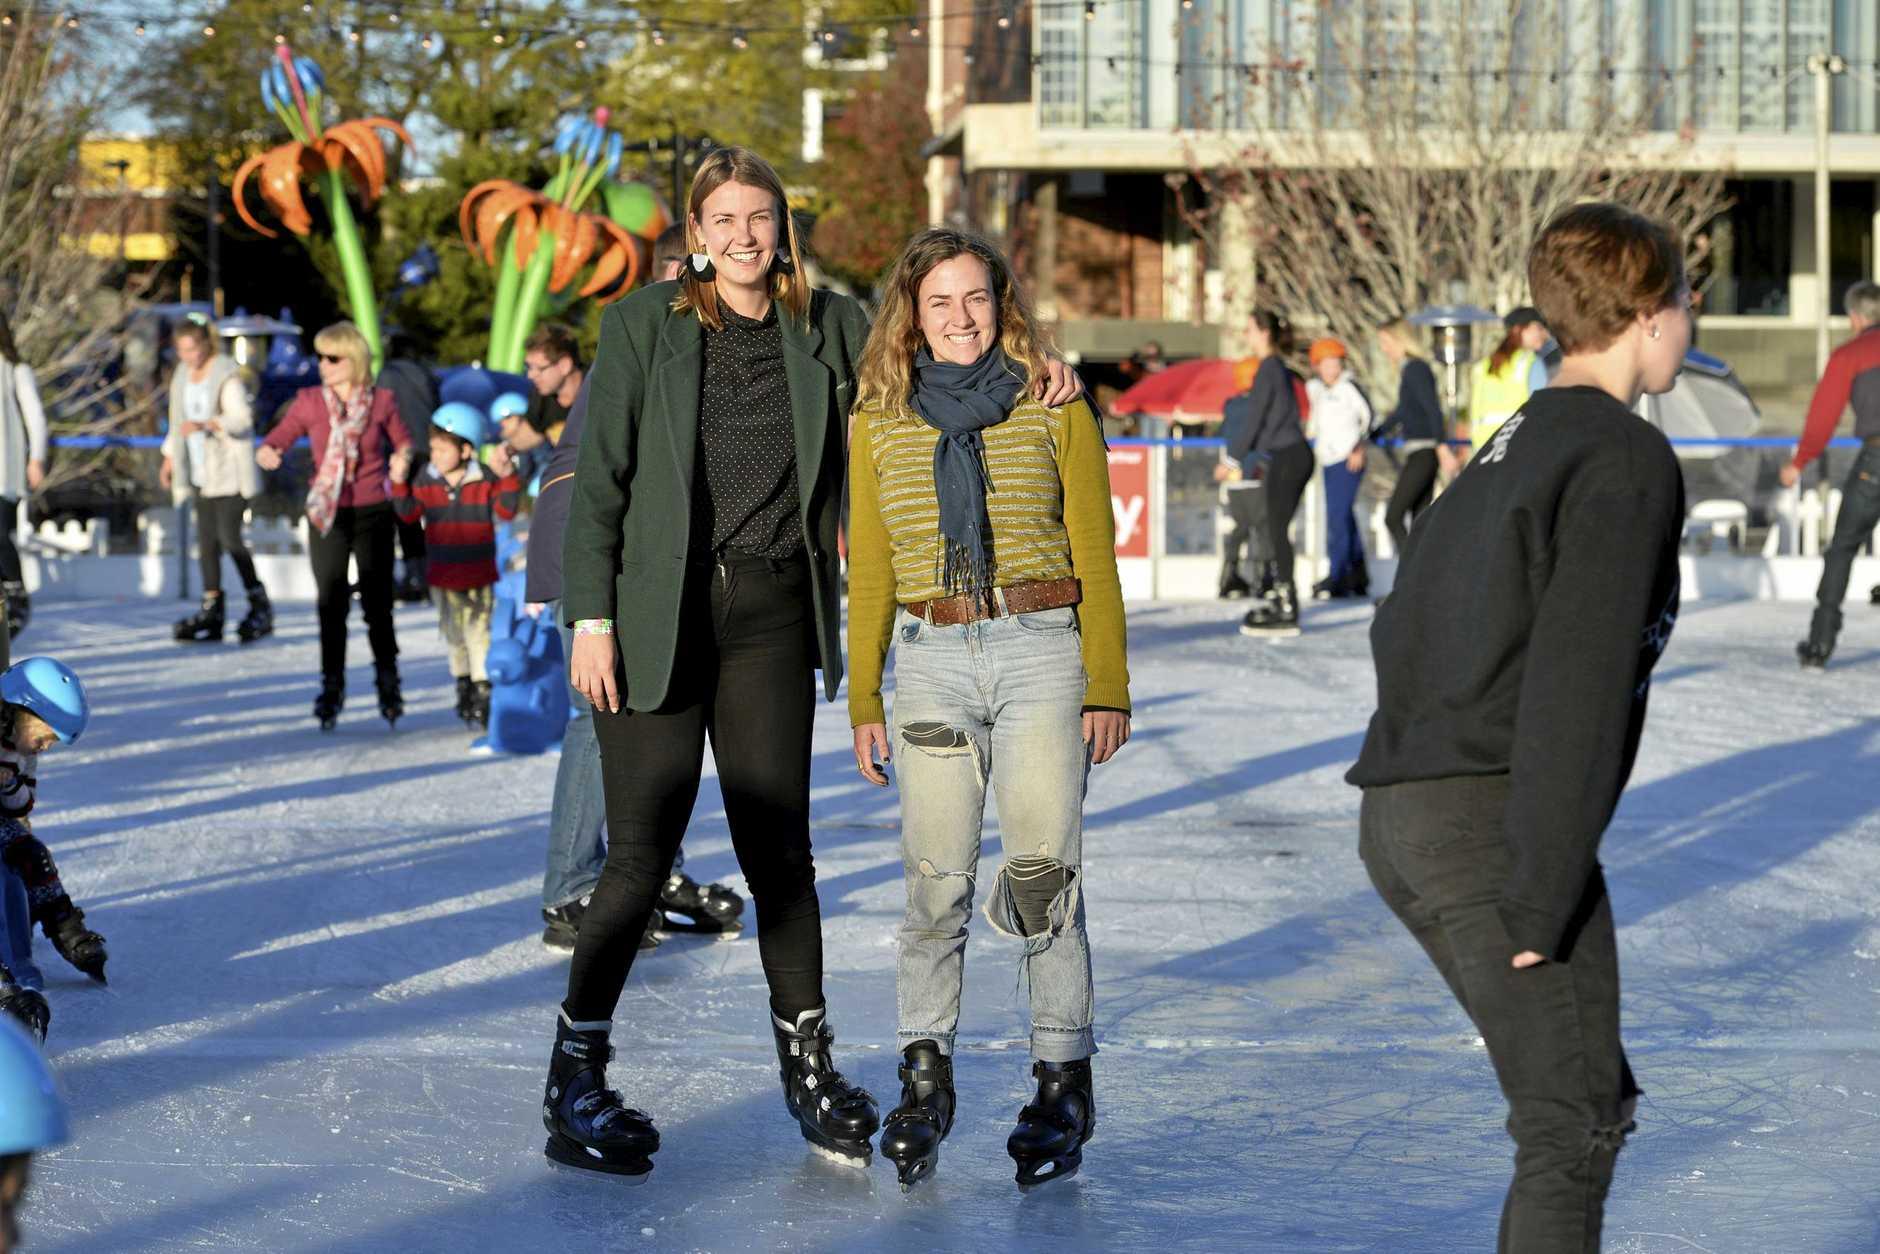 Grace Dewar (left) and Bronte Naylor ice skating at Winter Wonderland in the Civic Square, Friday, June 22, 2018.